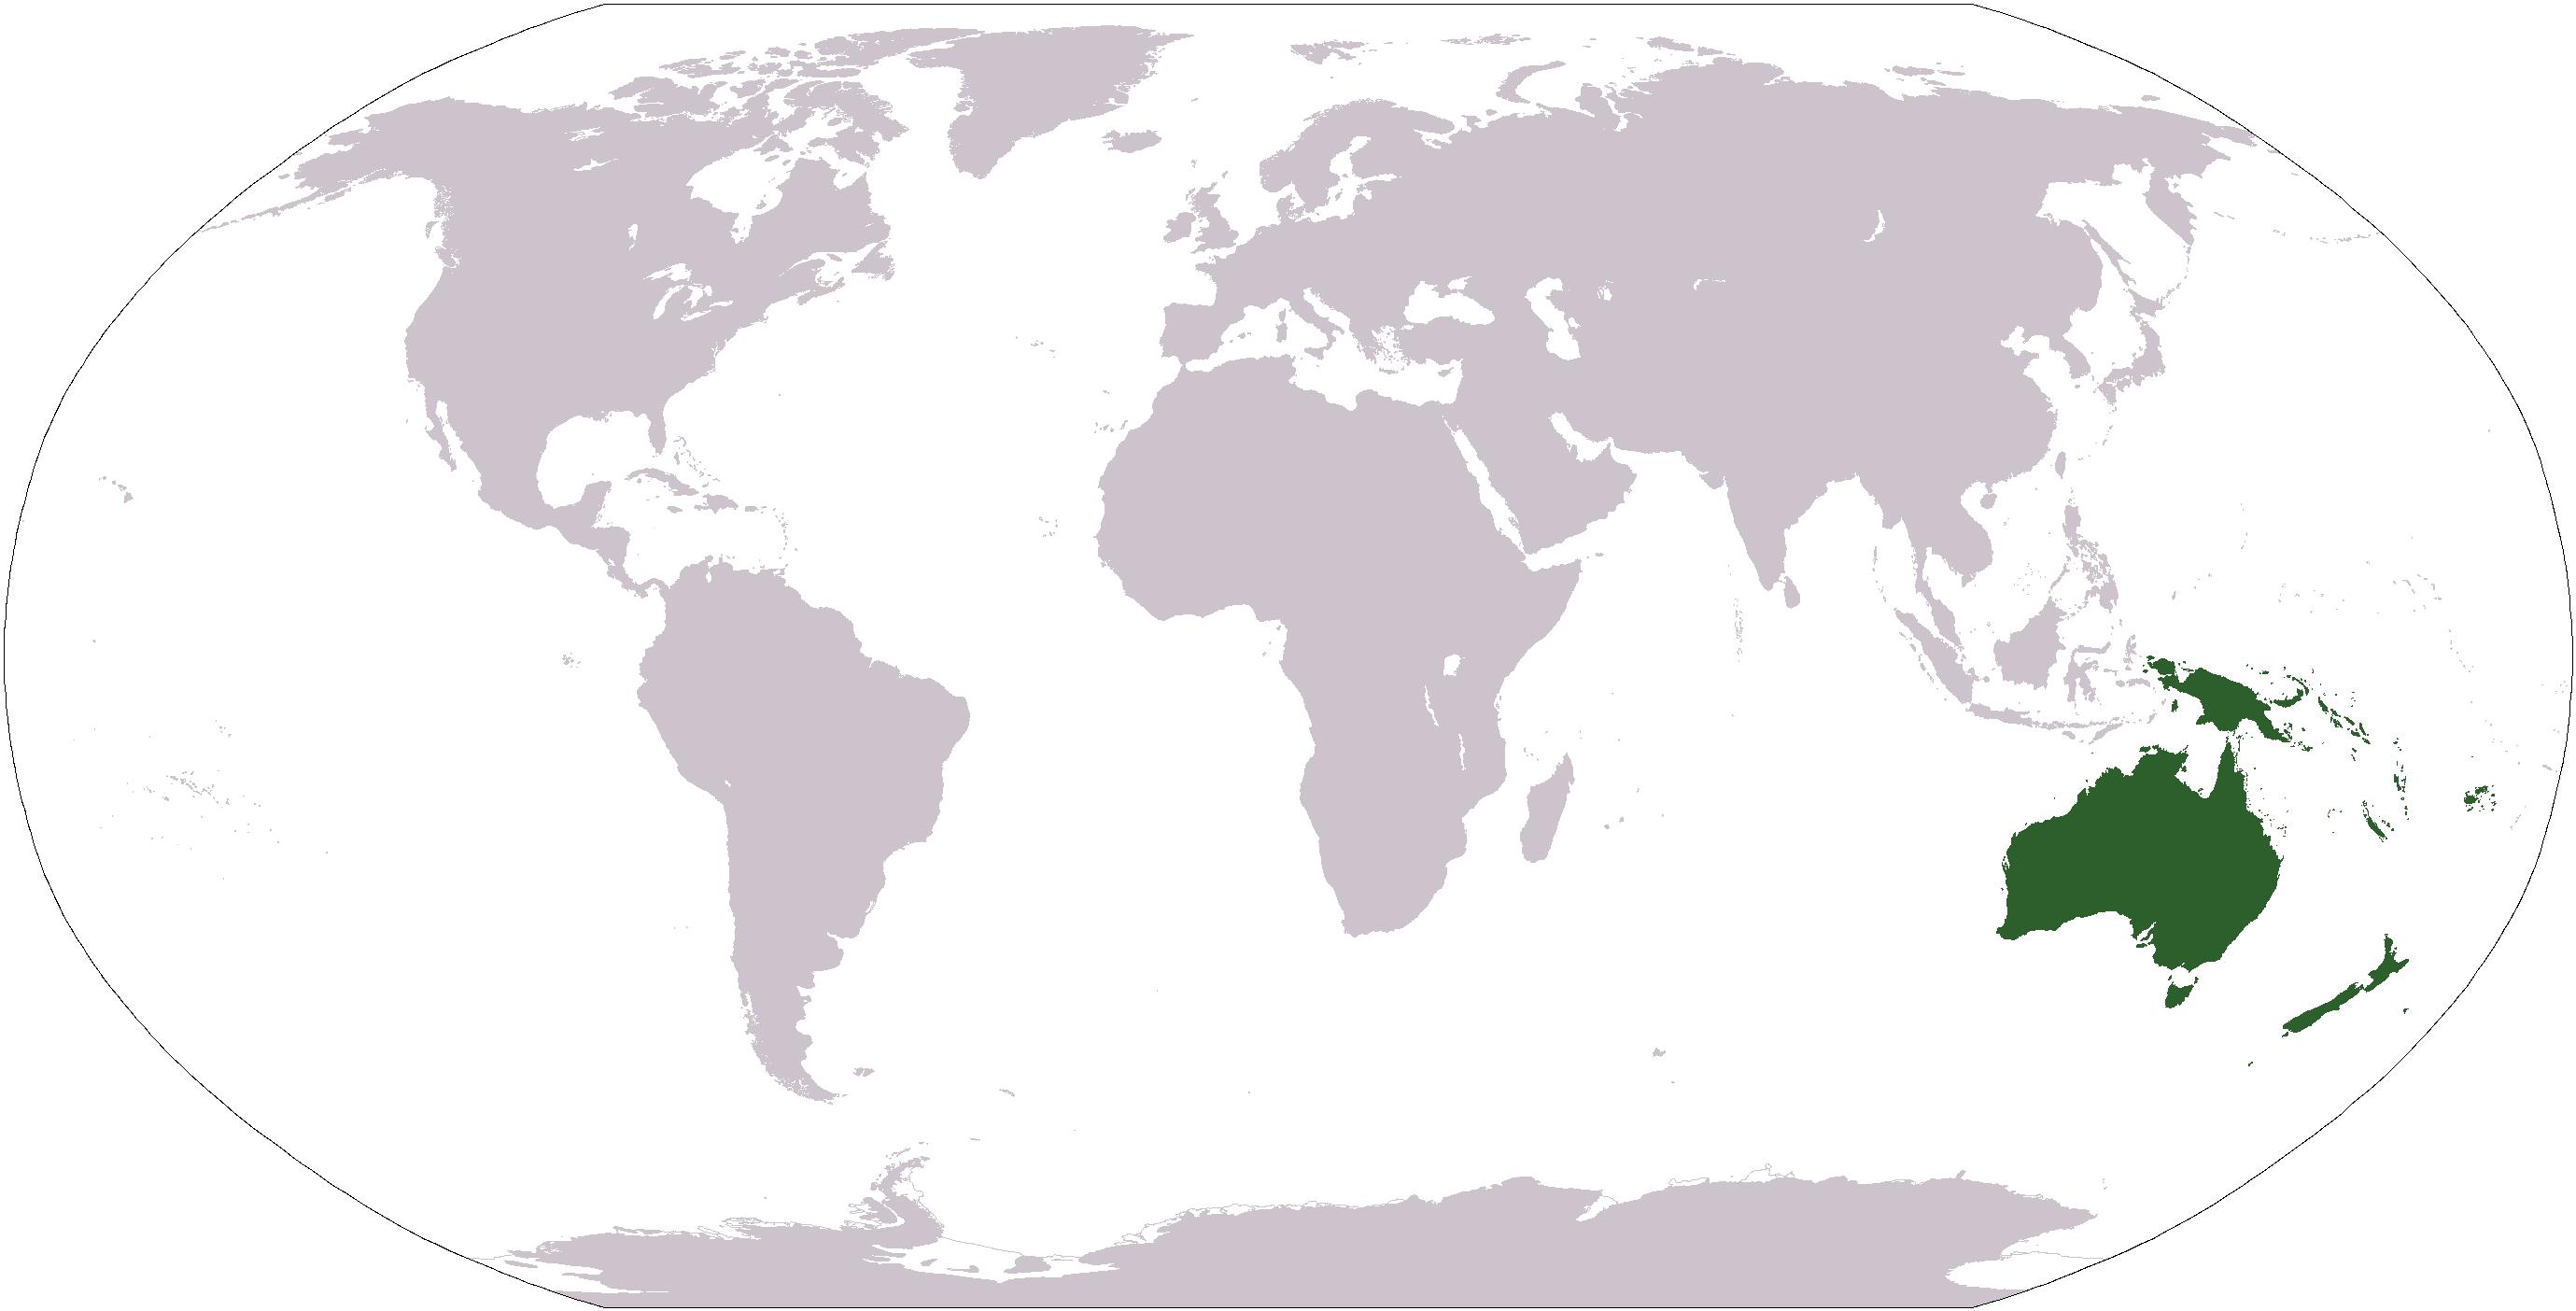 Ozeanische Zone